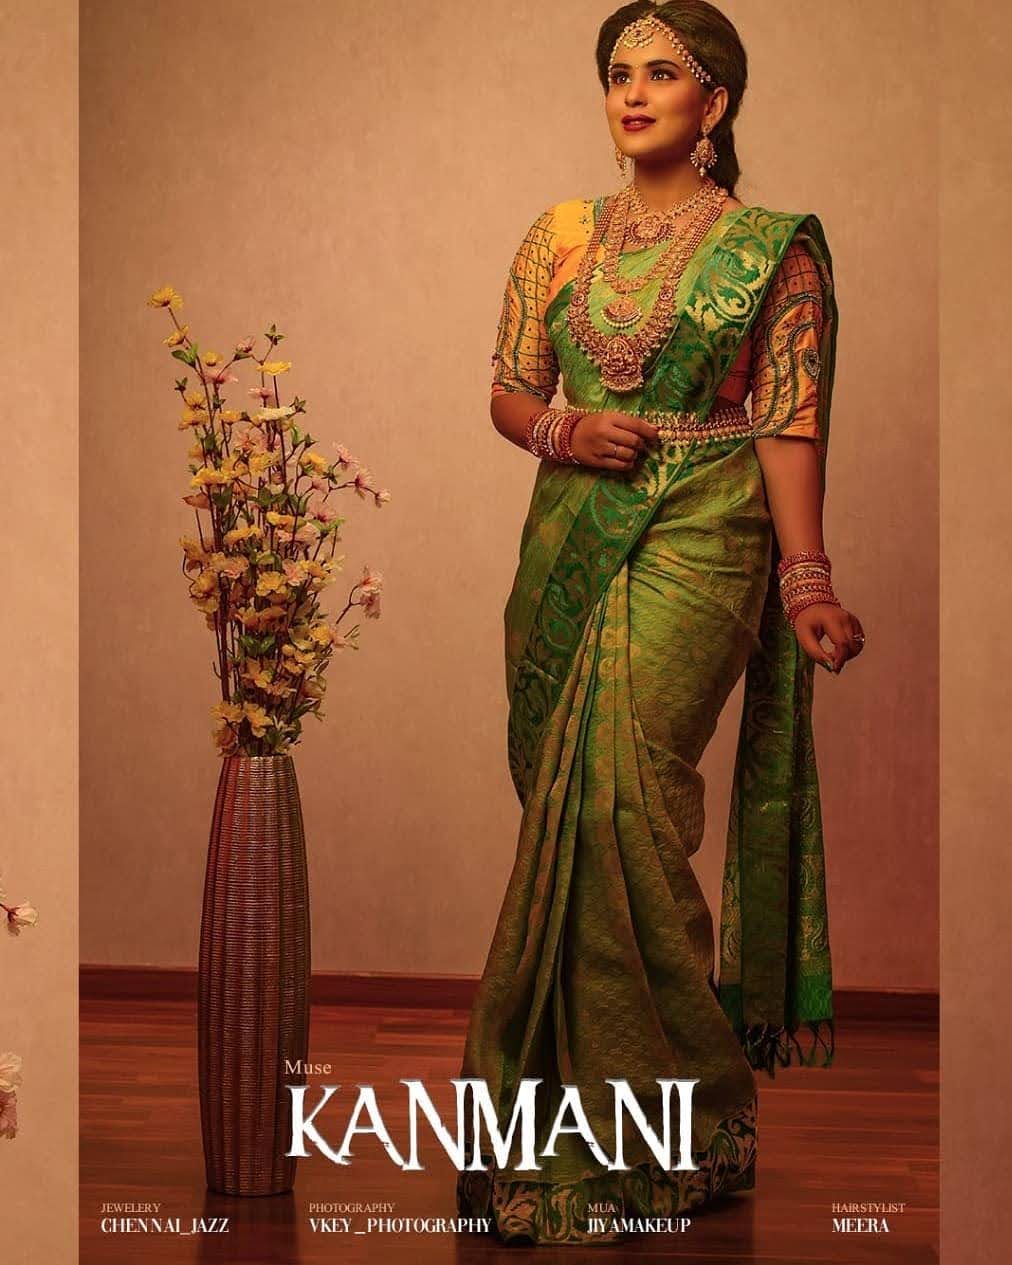 Kanmani-Sweety-Manoharan-Bharathi-Kannamma-33